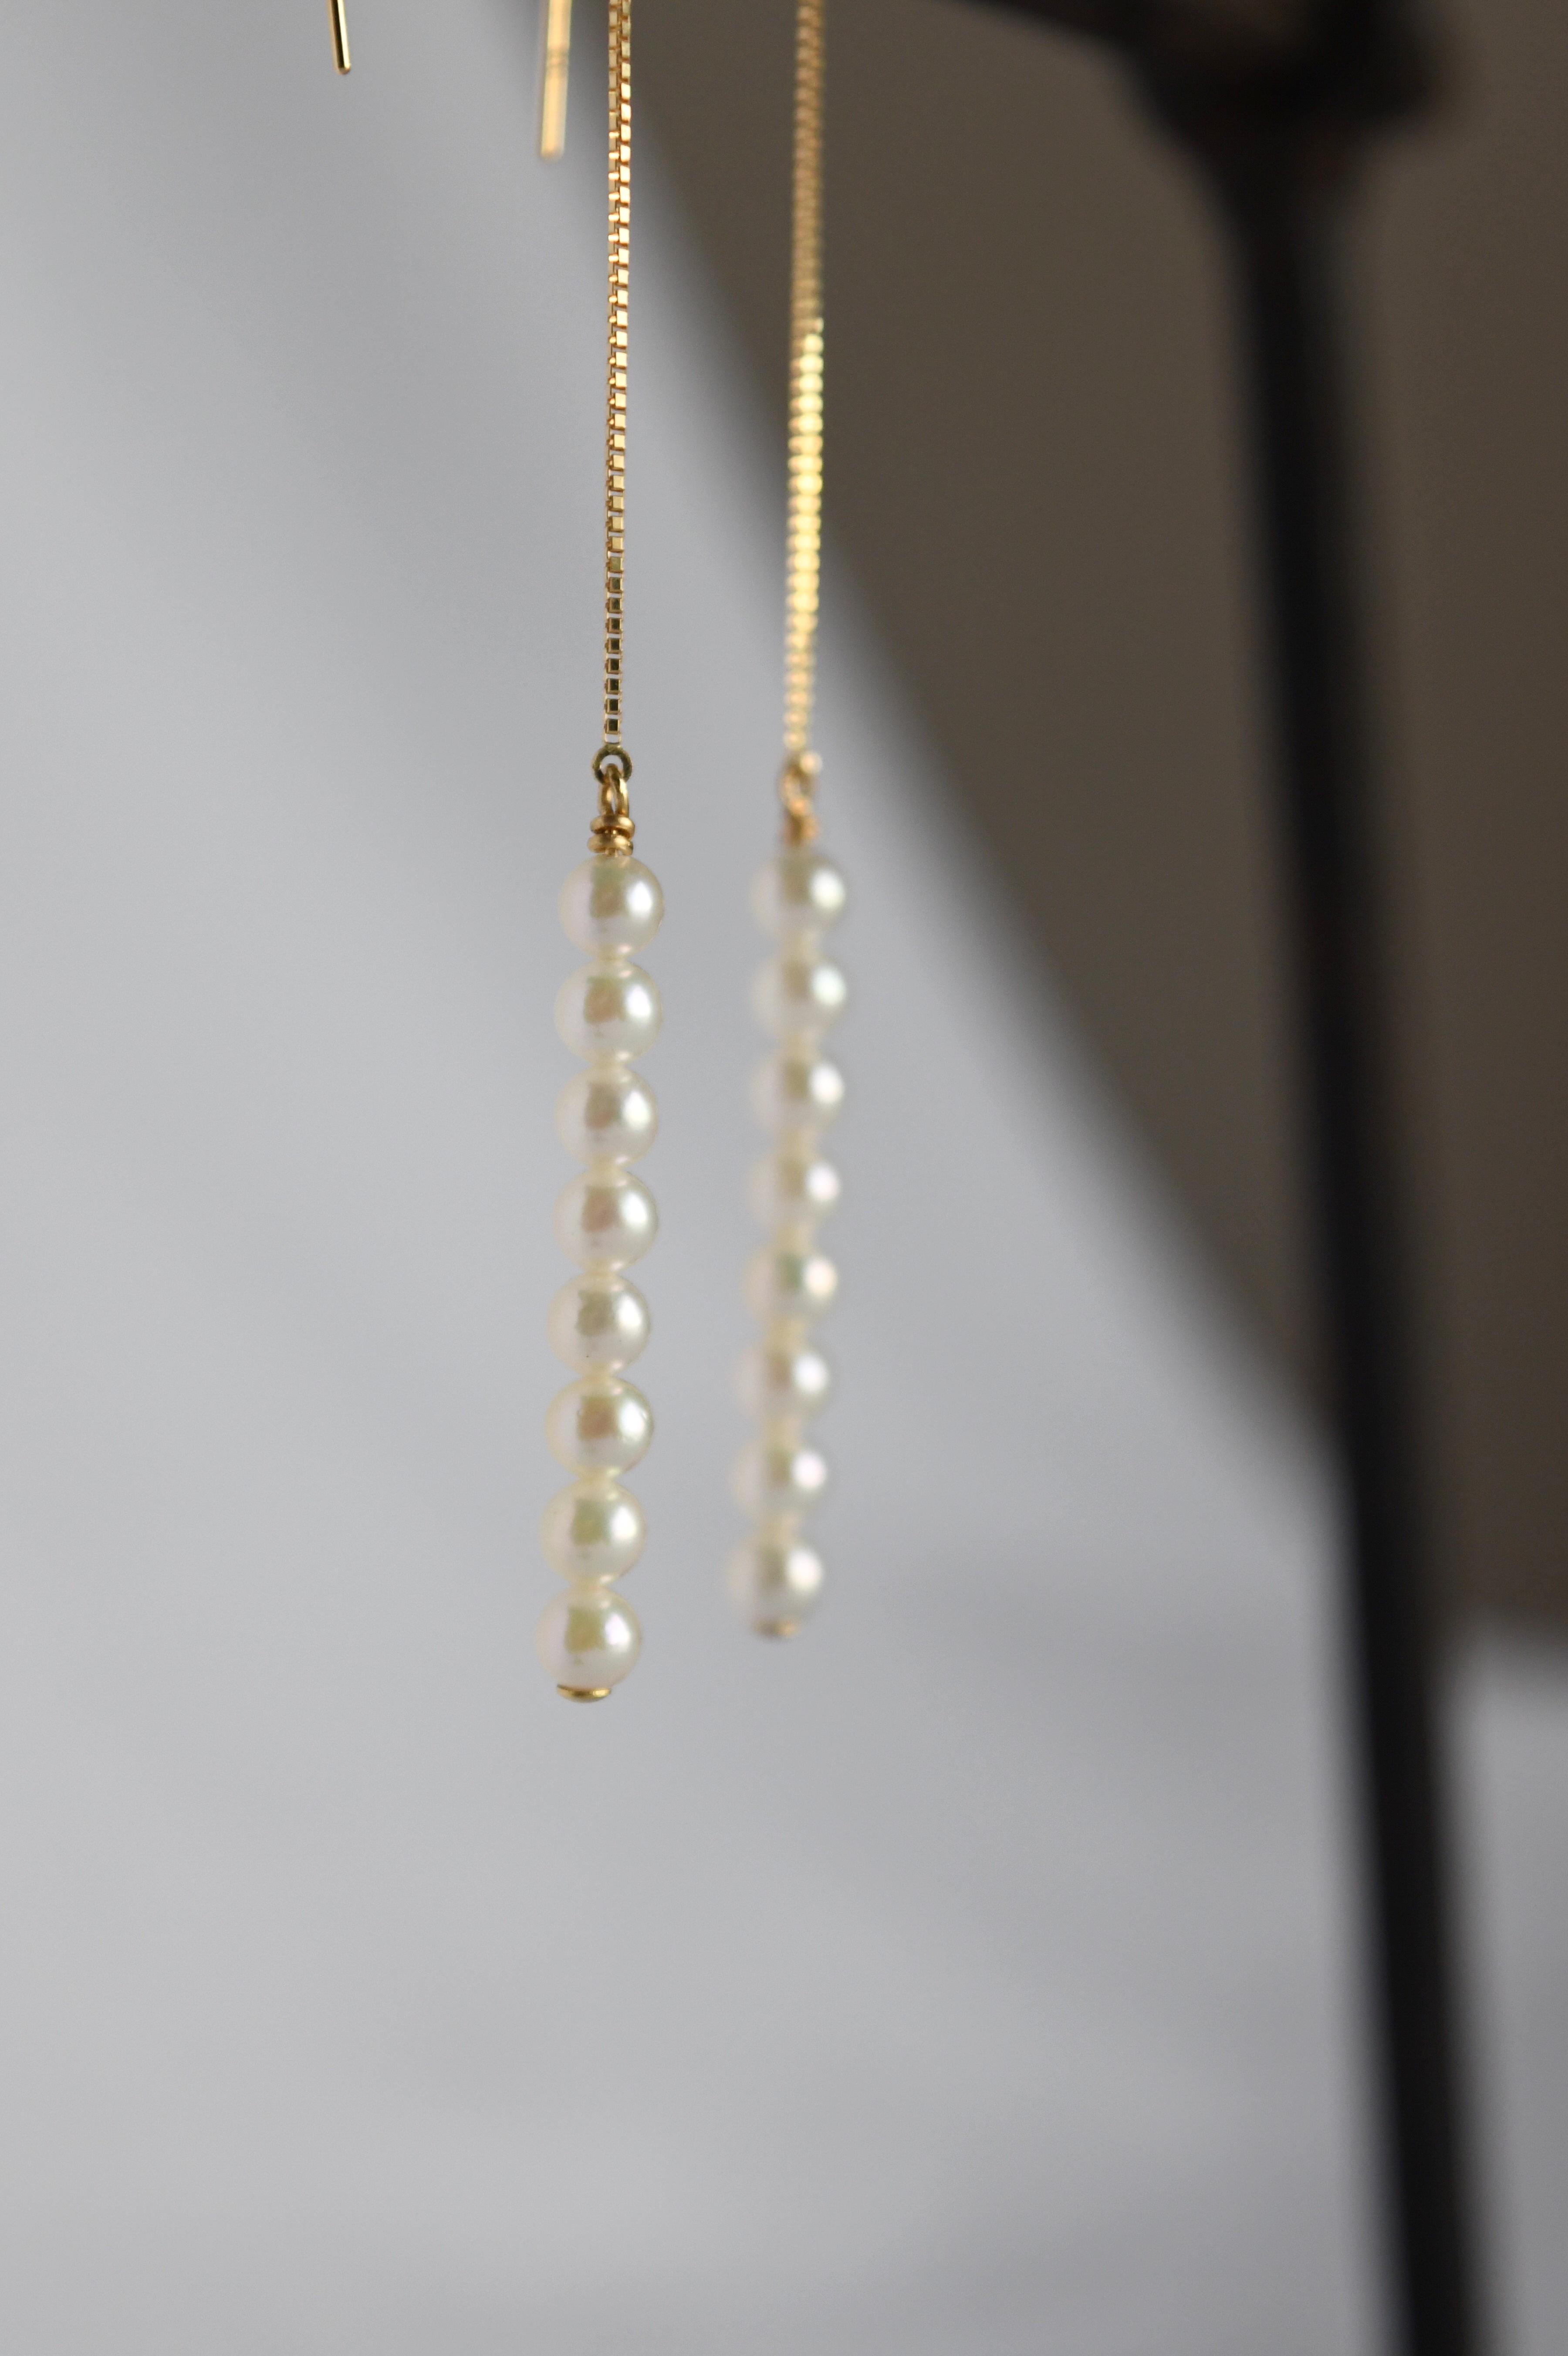 K18 Baby Akoya Pearl Long chain Earrings 18金ベビーアコヤ真珠ロングチェーンピアス